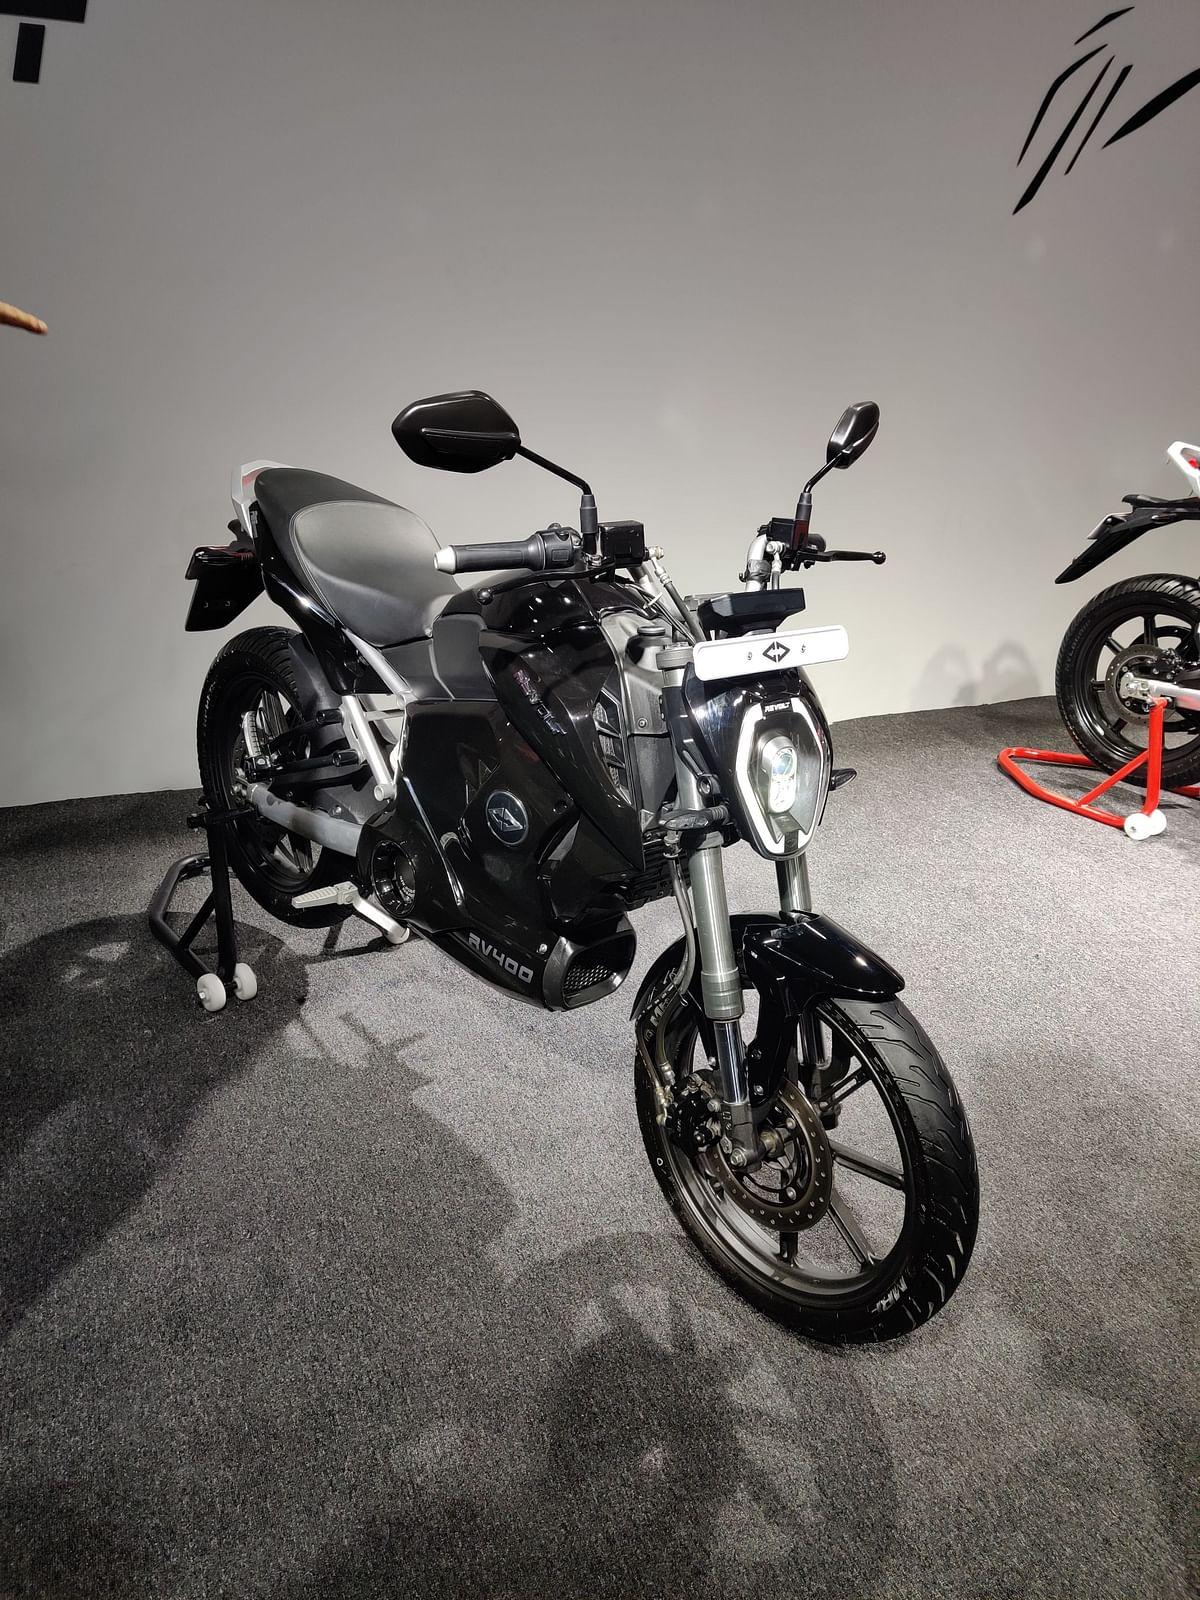 Revolt RV400 unveiled